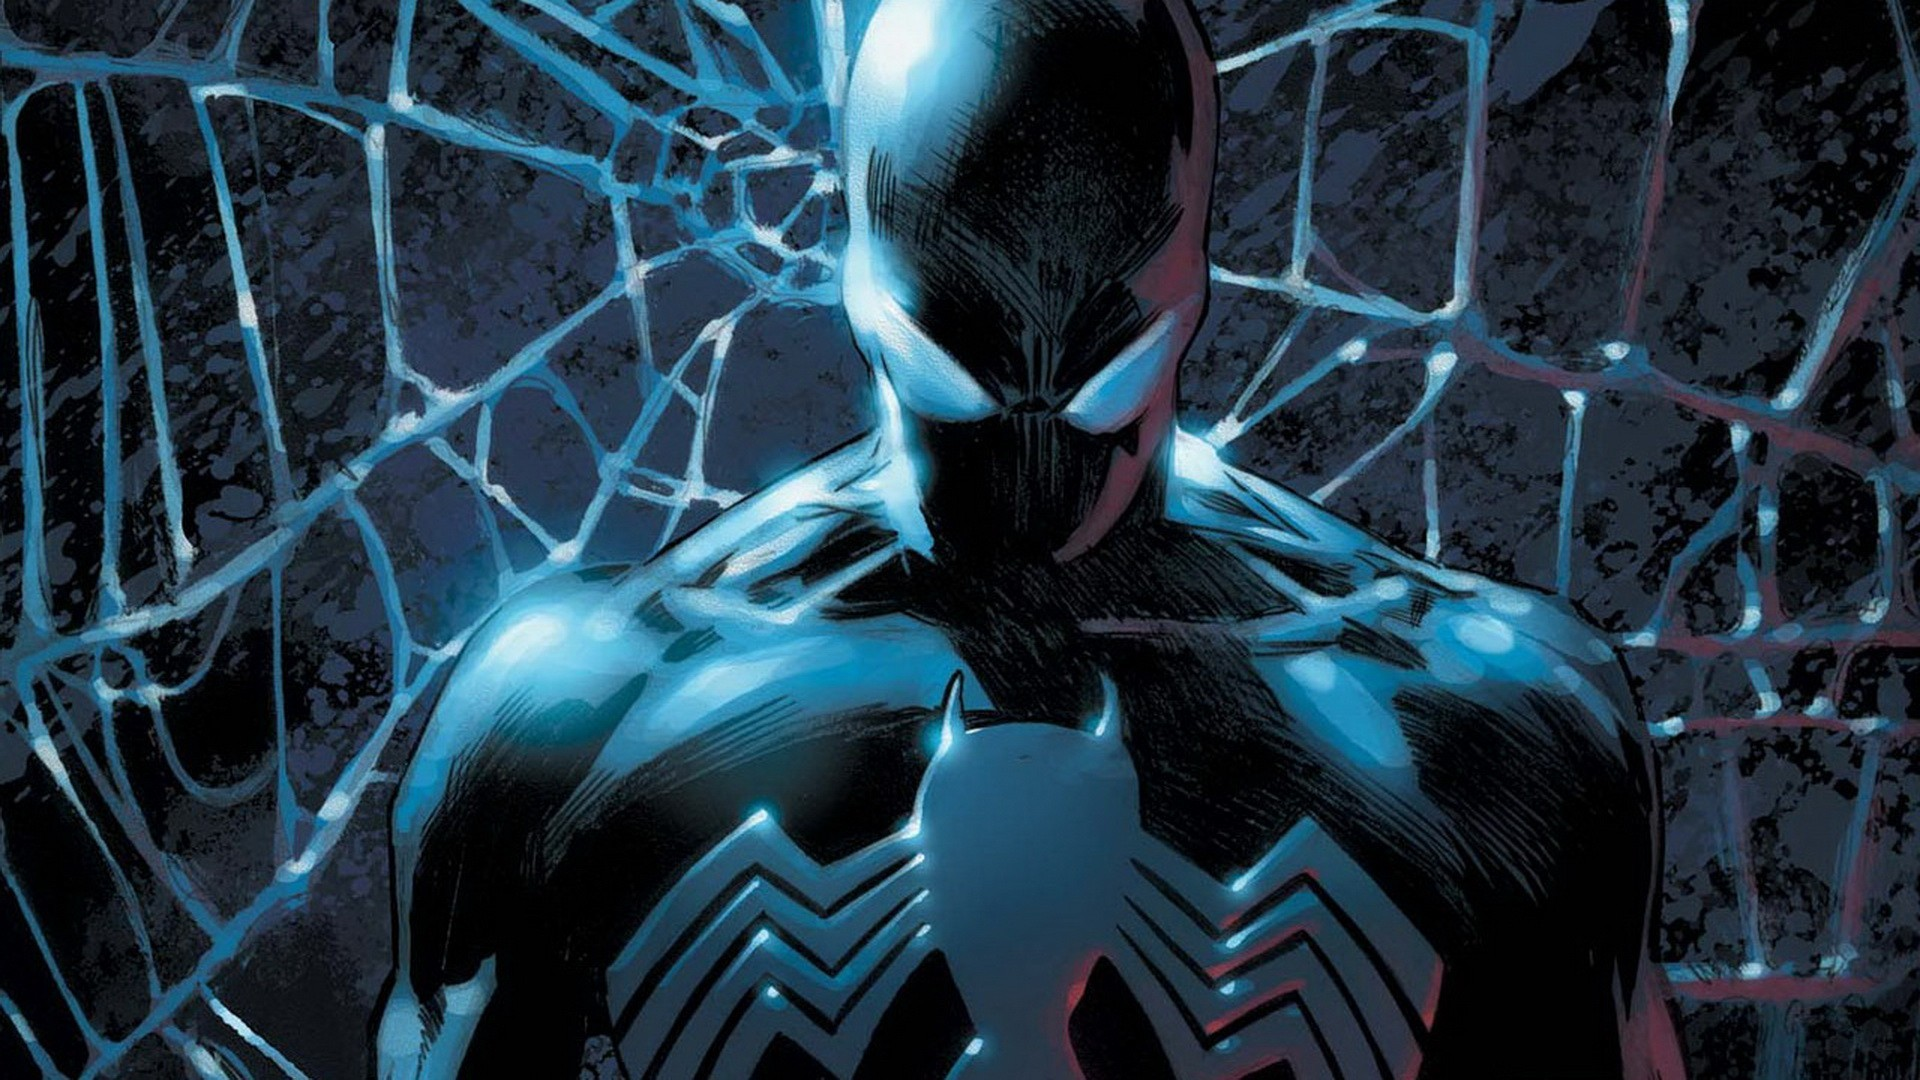 Spiderman Wallpaper Hd Download Free Hd Wallpapers For Desktop